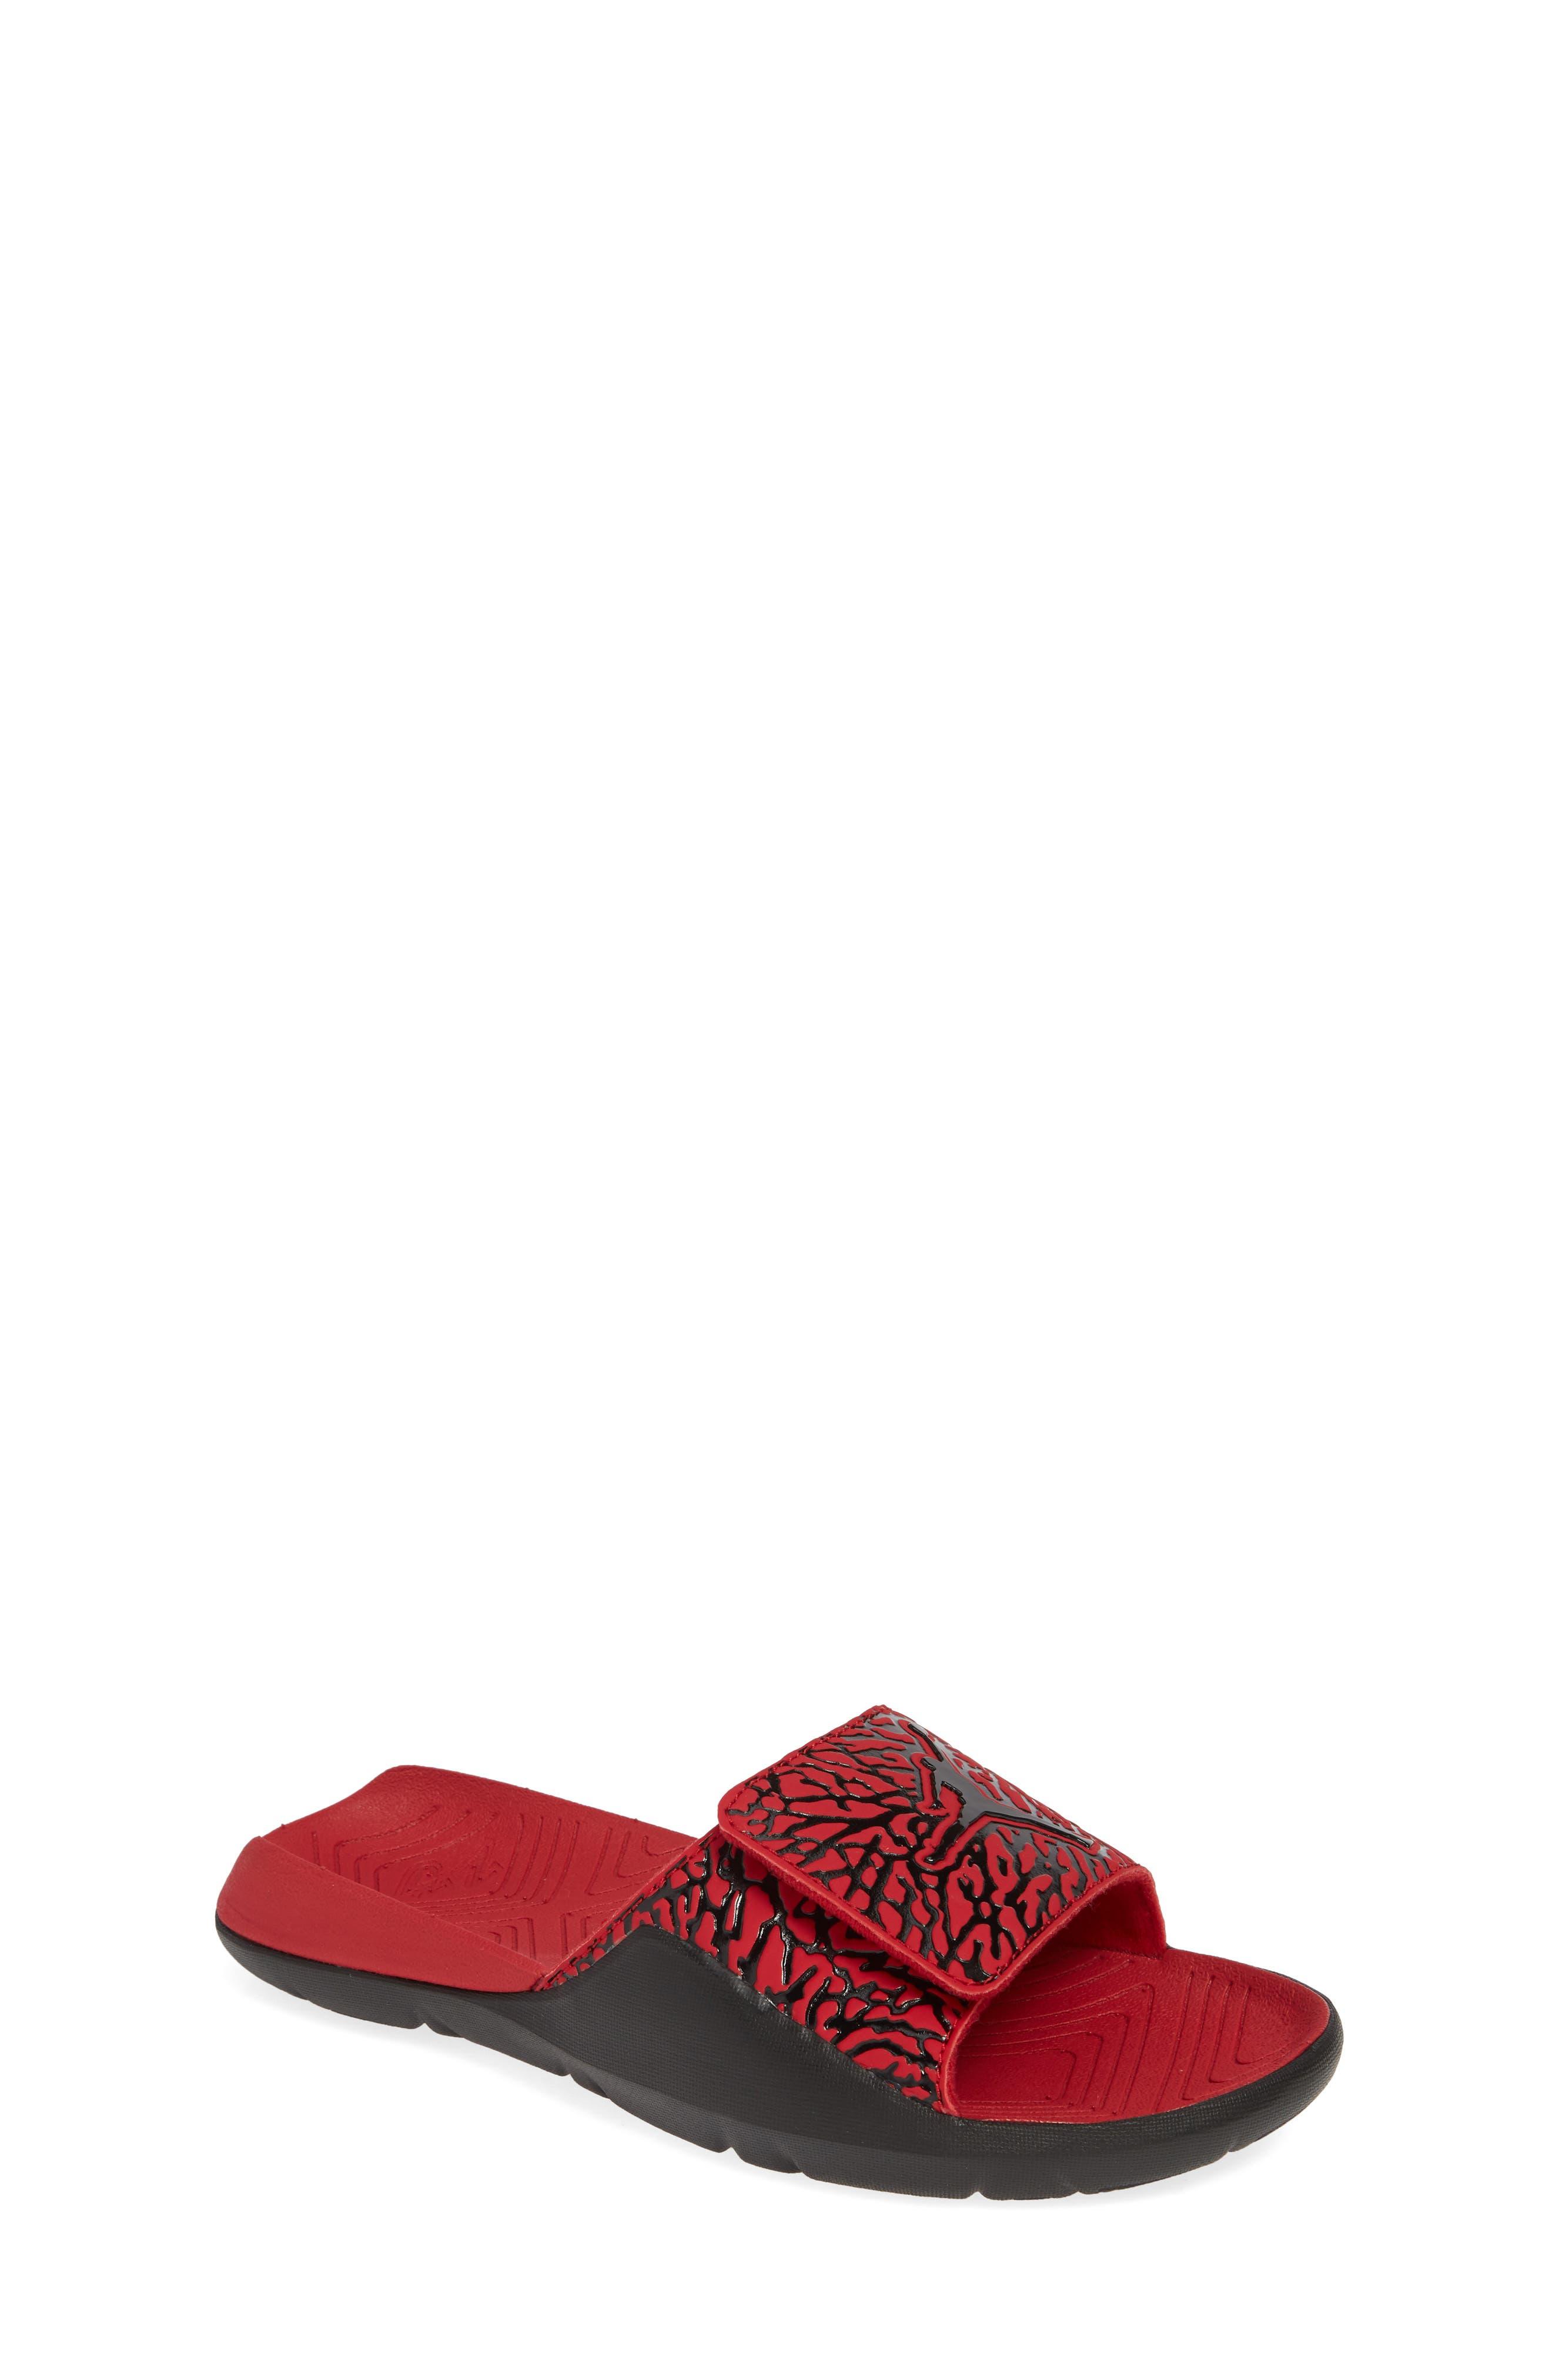 JORDAN, Hydro 7 V2 Sandal, Main thumbnail 1, color, GYM RED/ BLACK